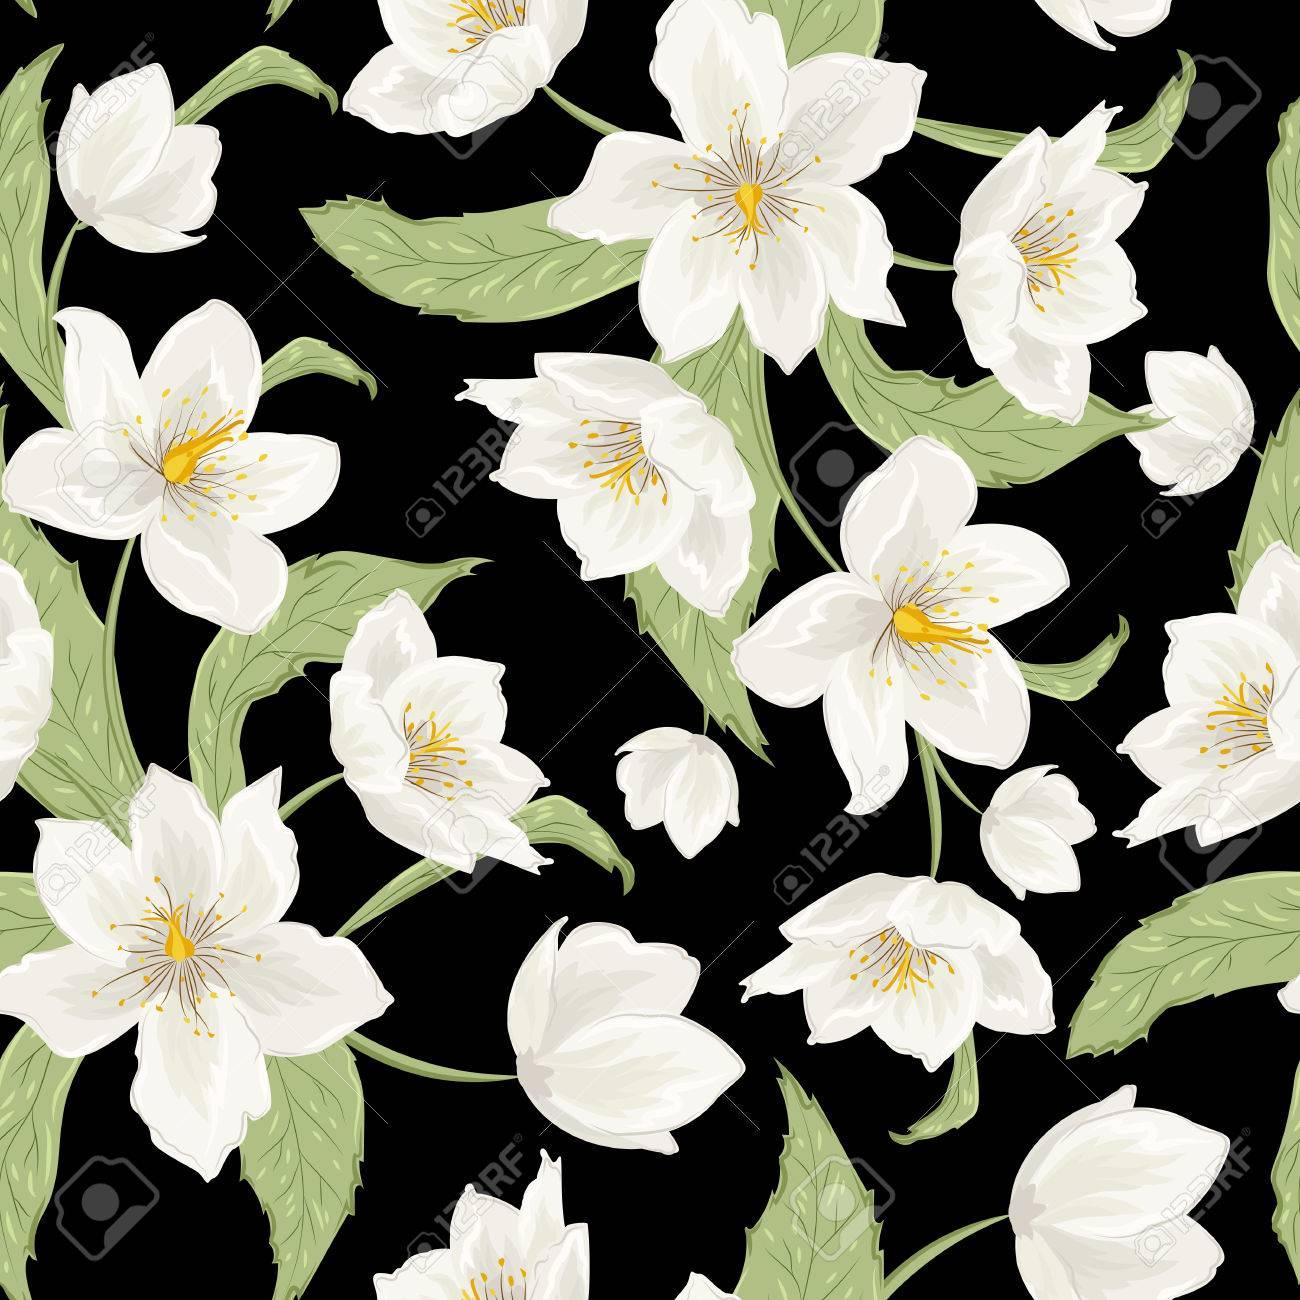 Christmas Rose Hellebore Flowers Seamless Pattern On Black